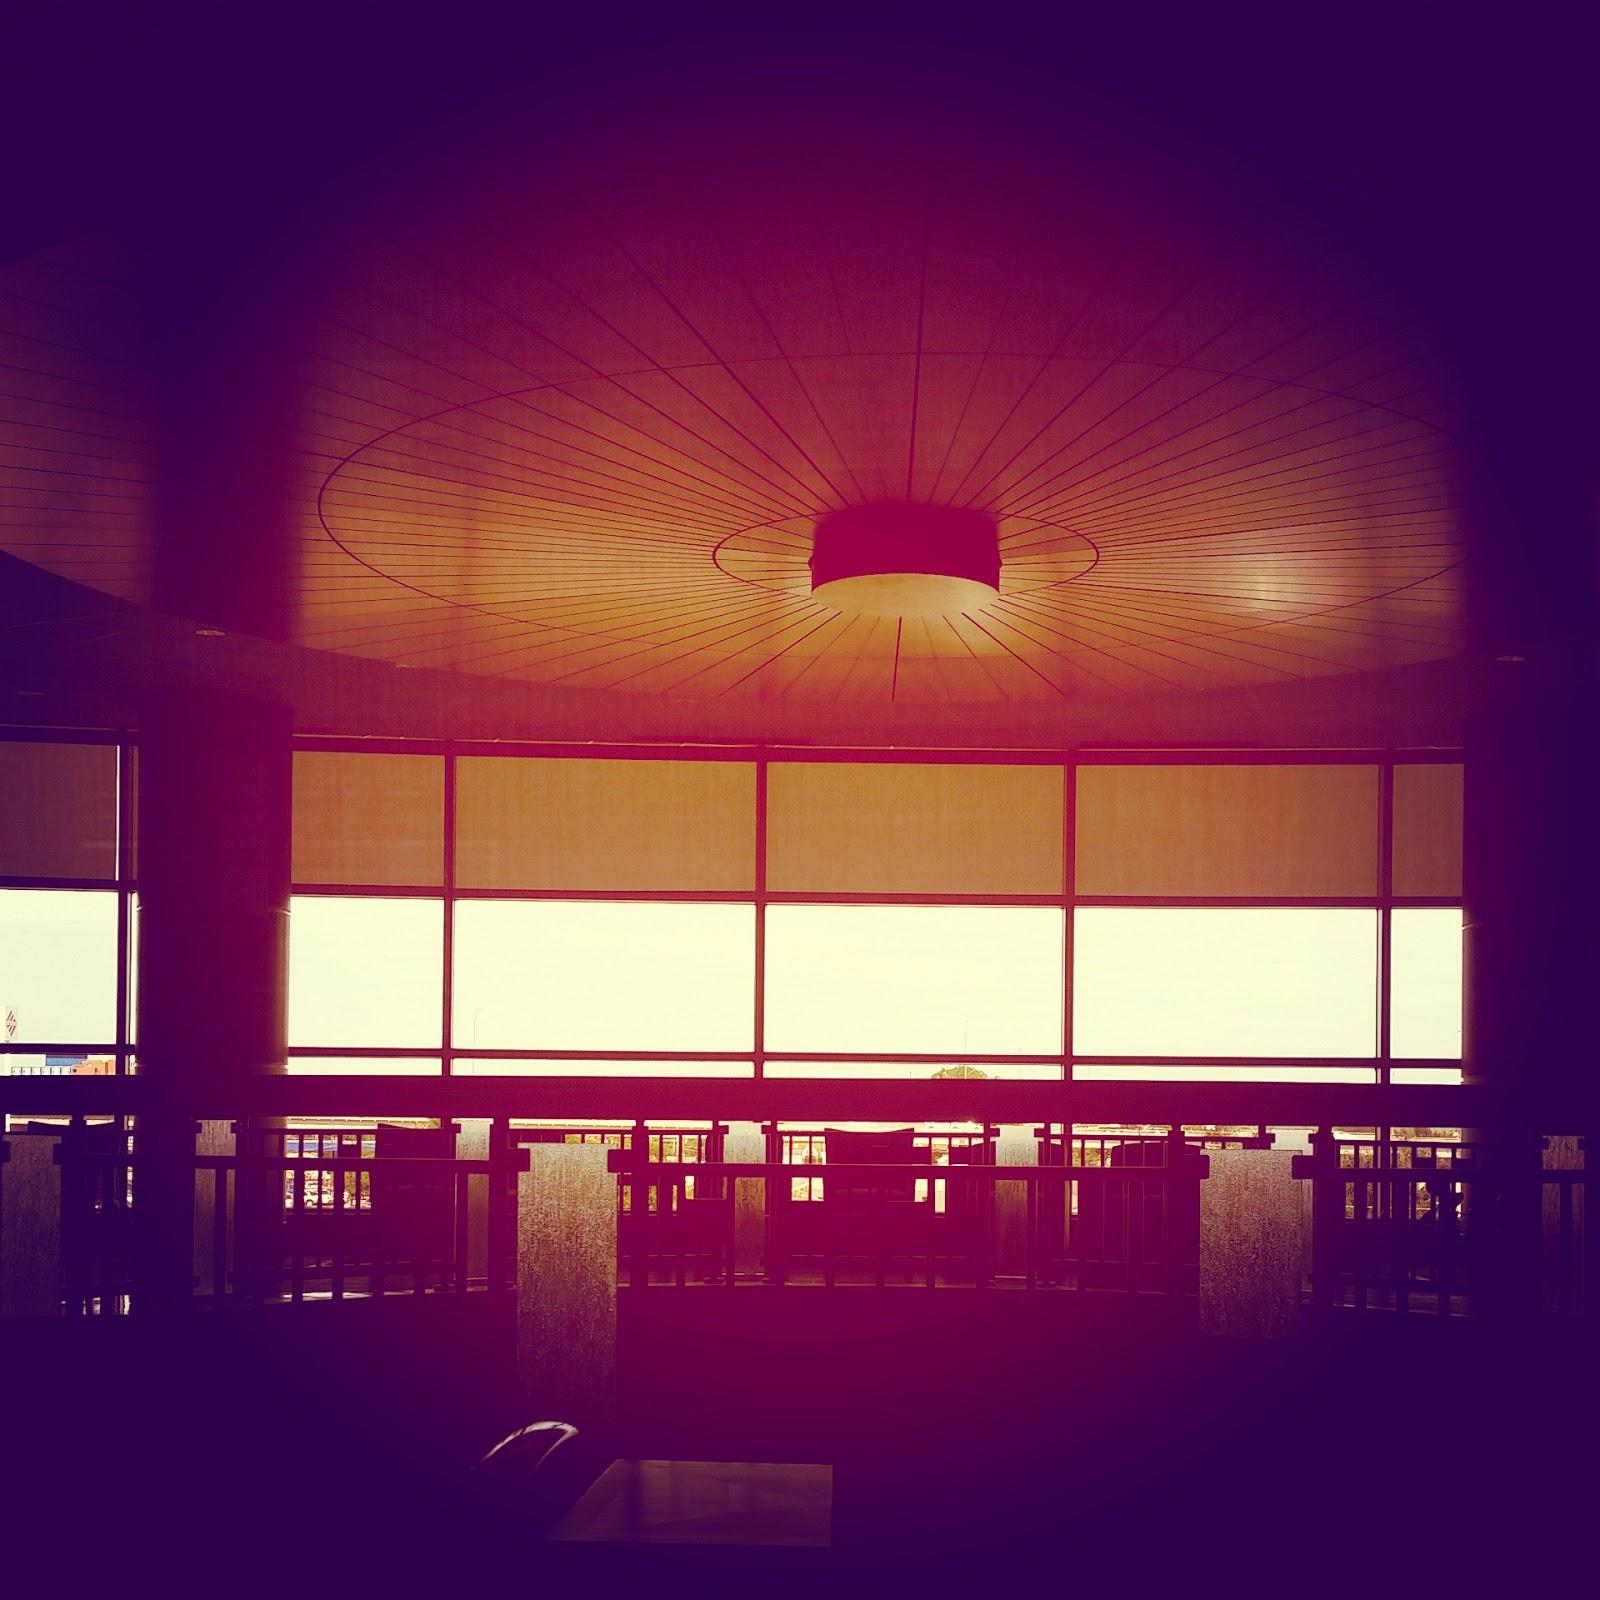 My view in United Regional Hospital as I wait...